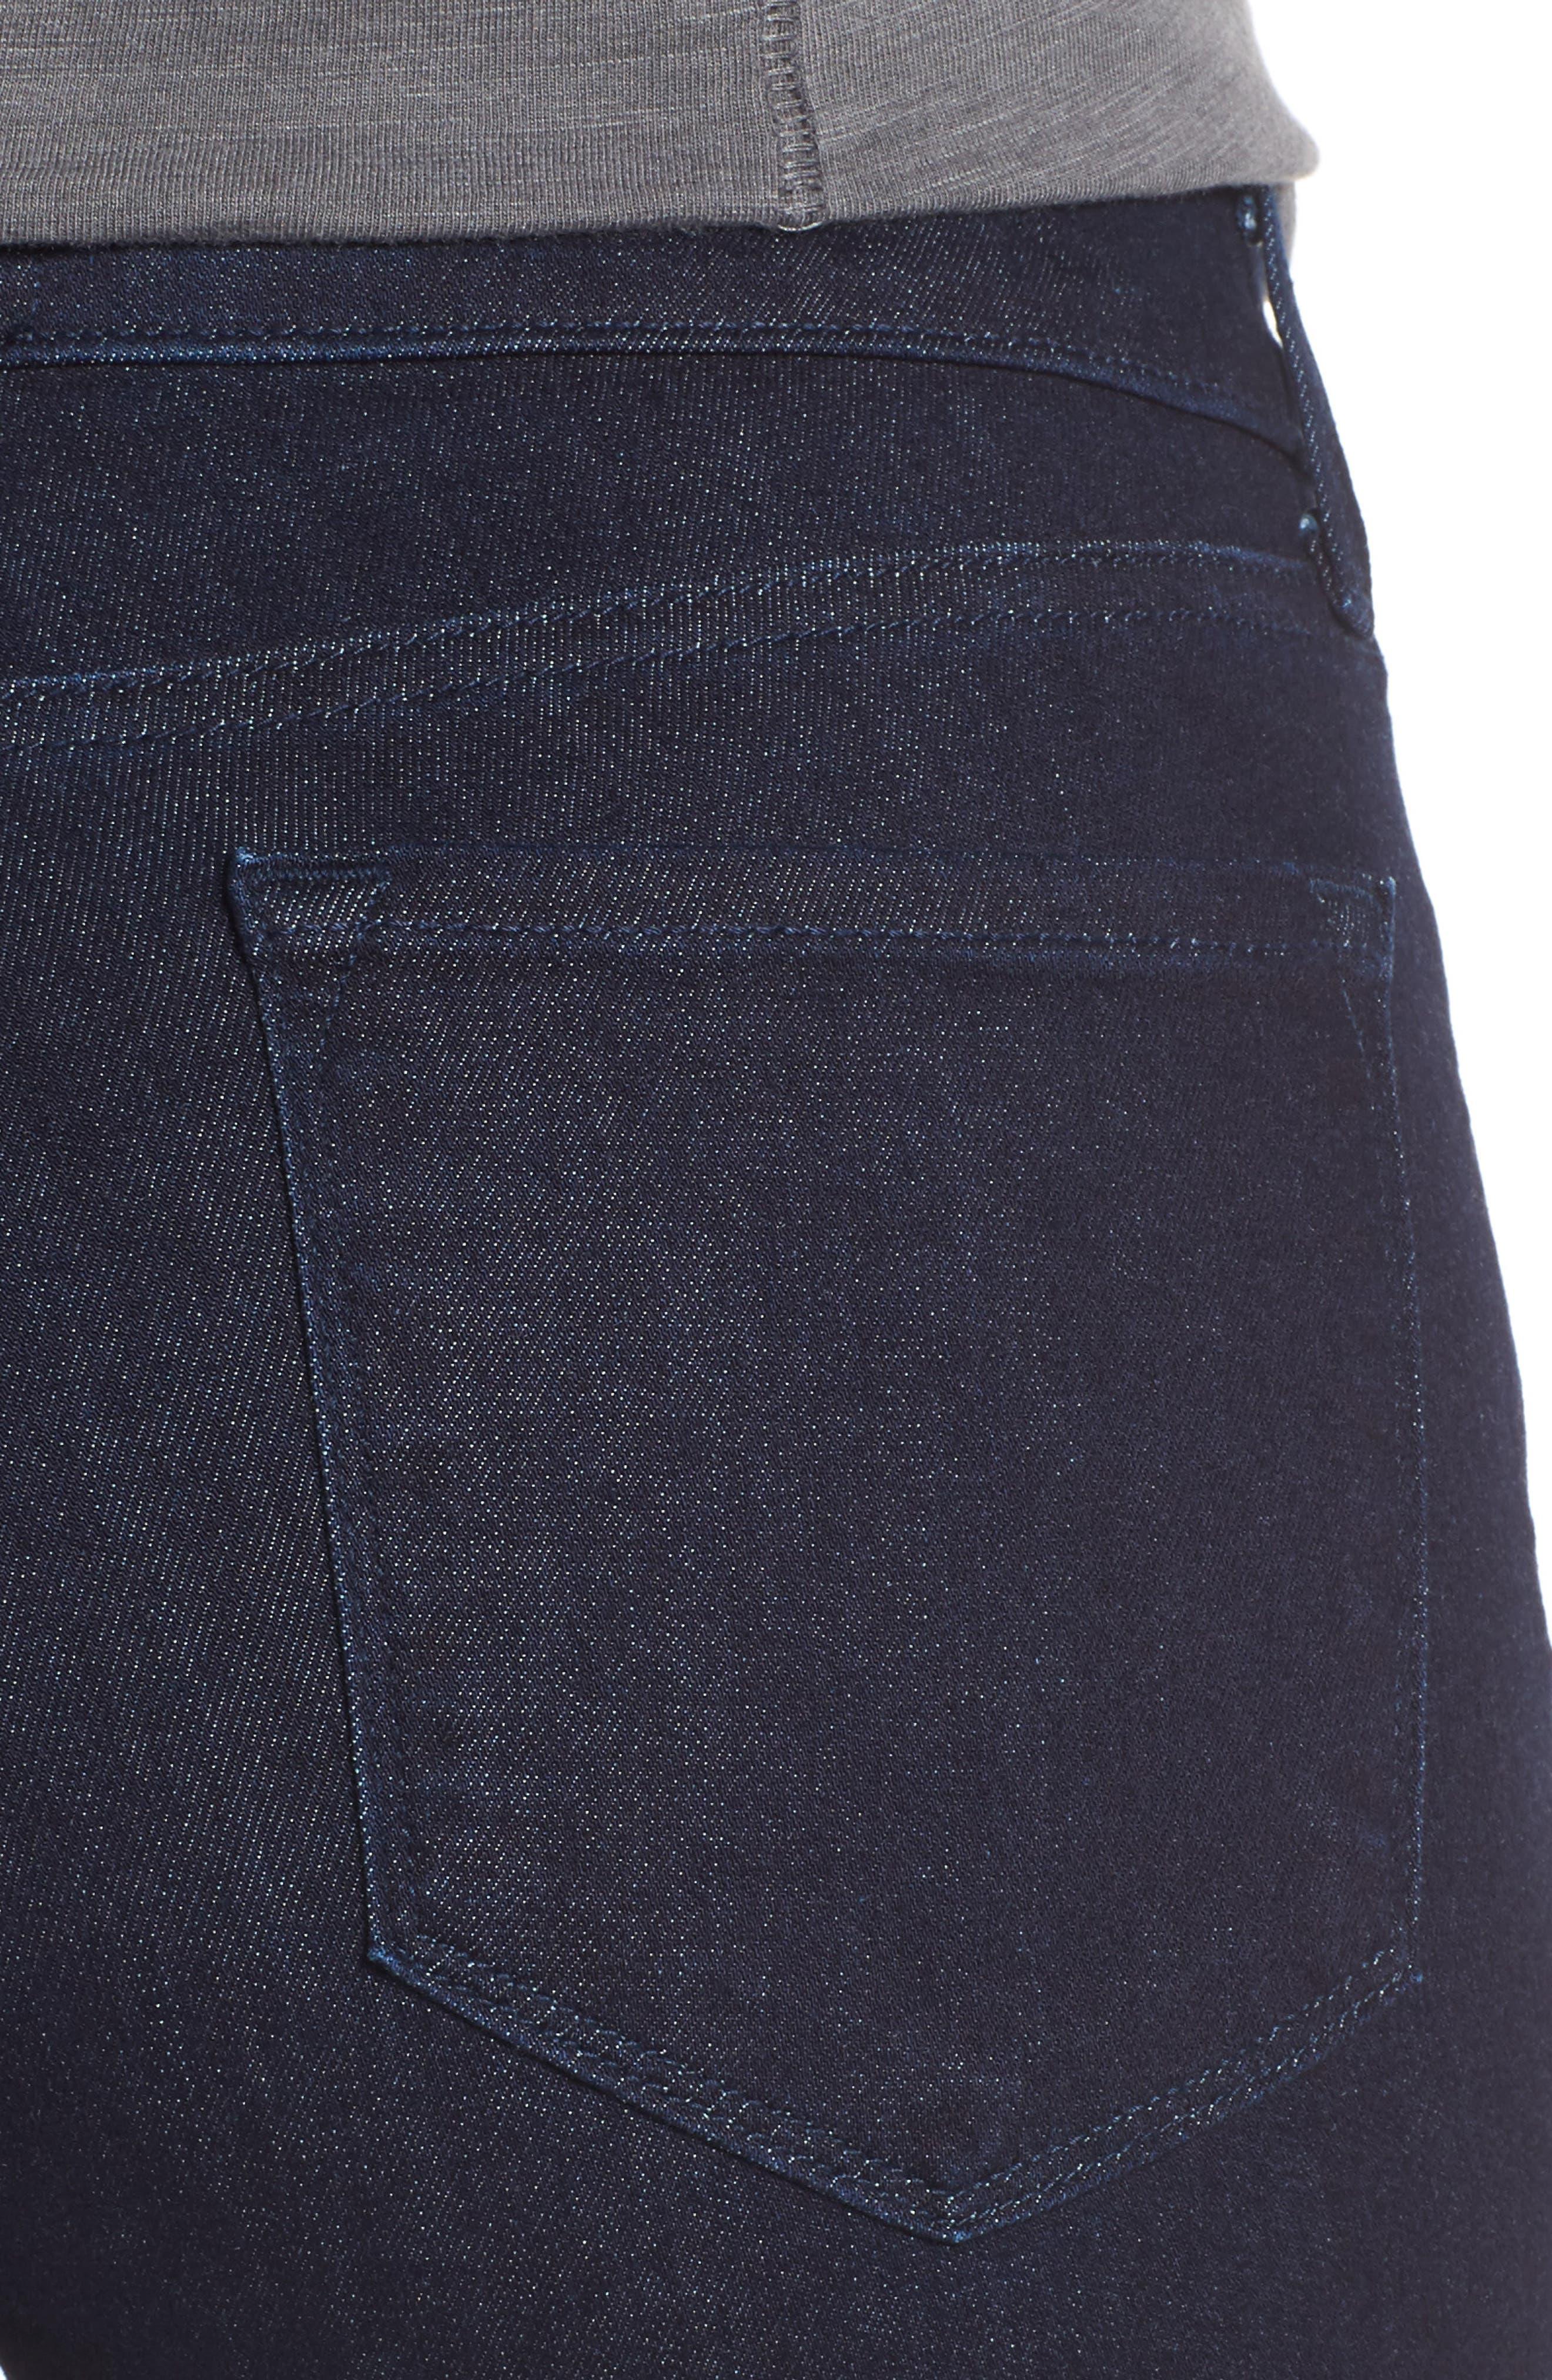 Alternate Image 4  - NYDJ Marilyn Stretch Straight Leg Jeans (Rinse) (Regular & Petite)